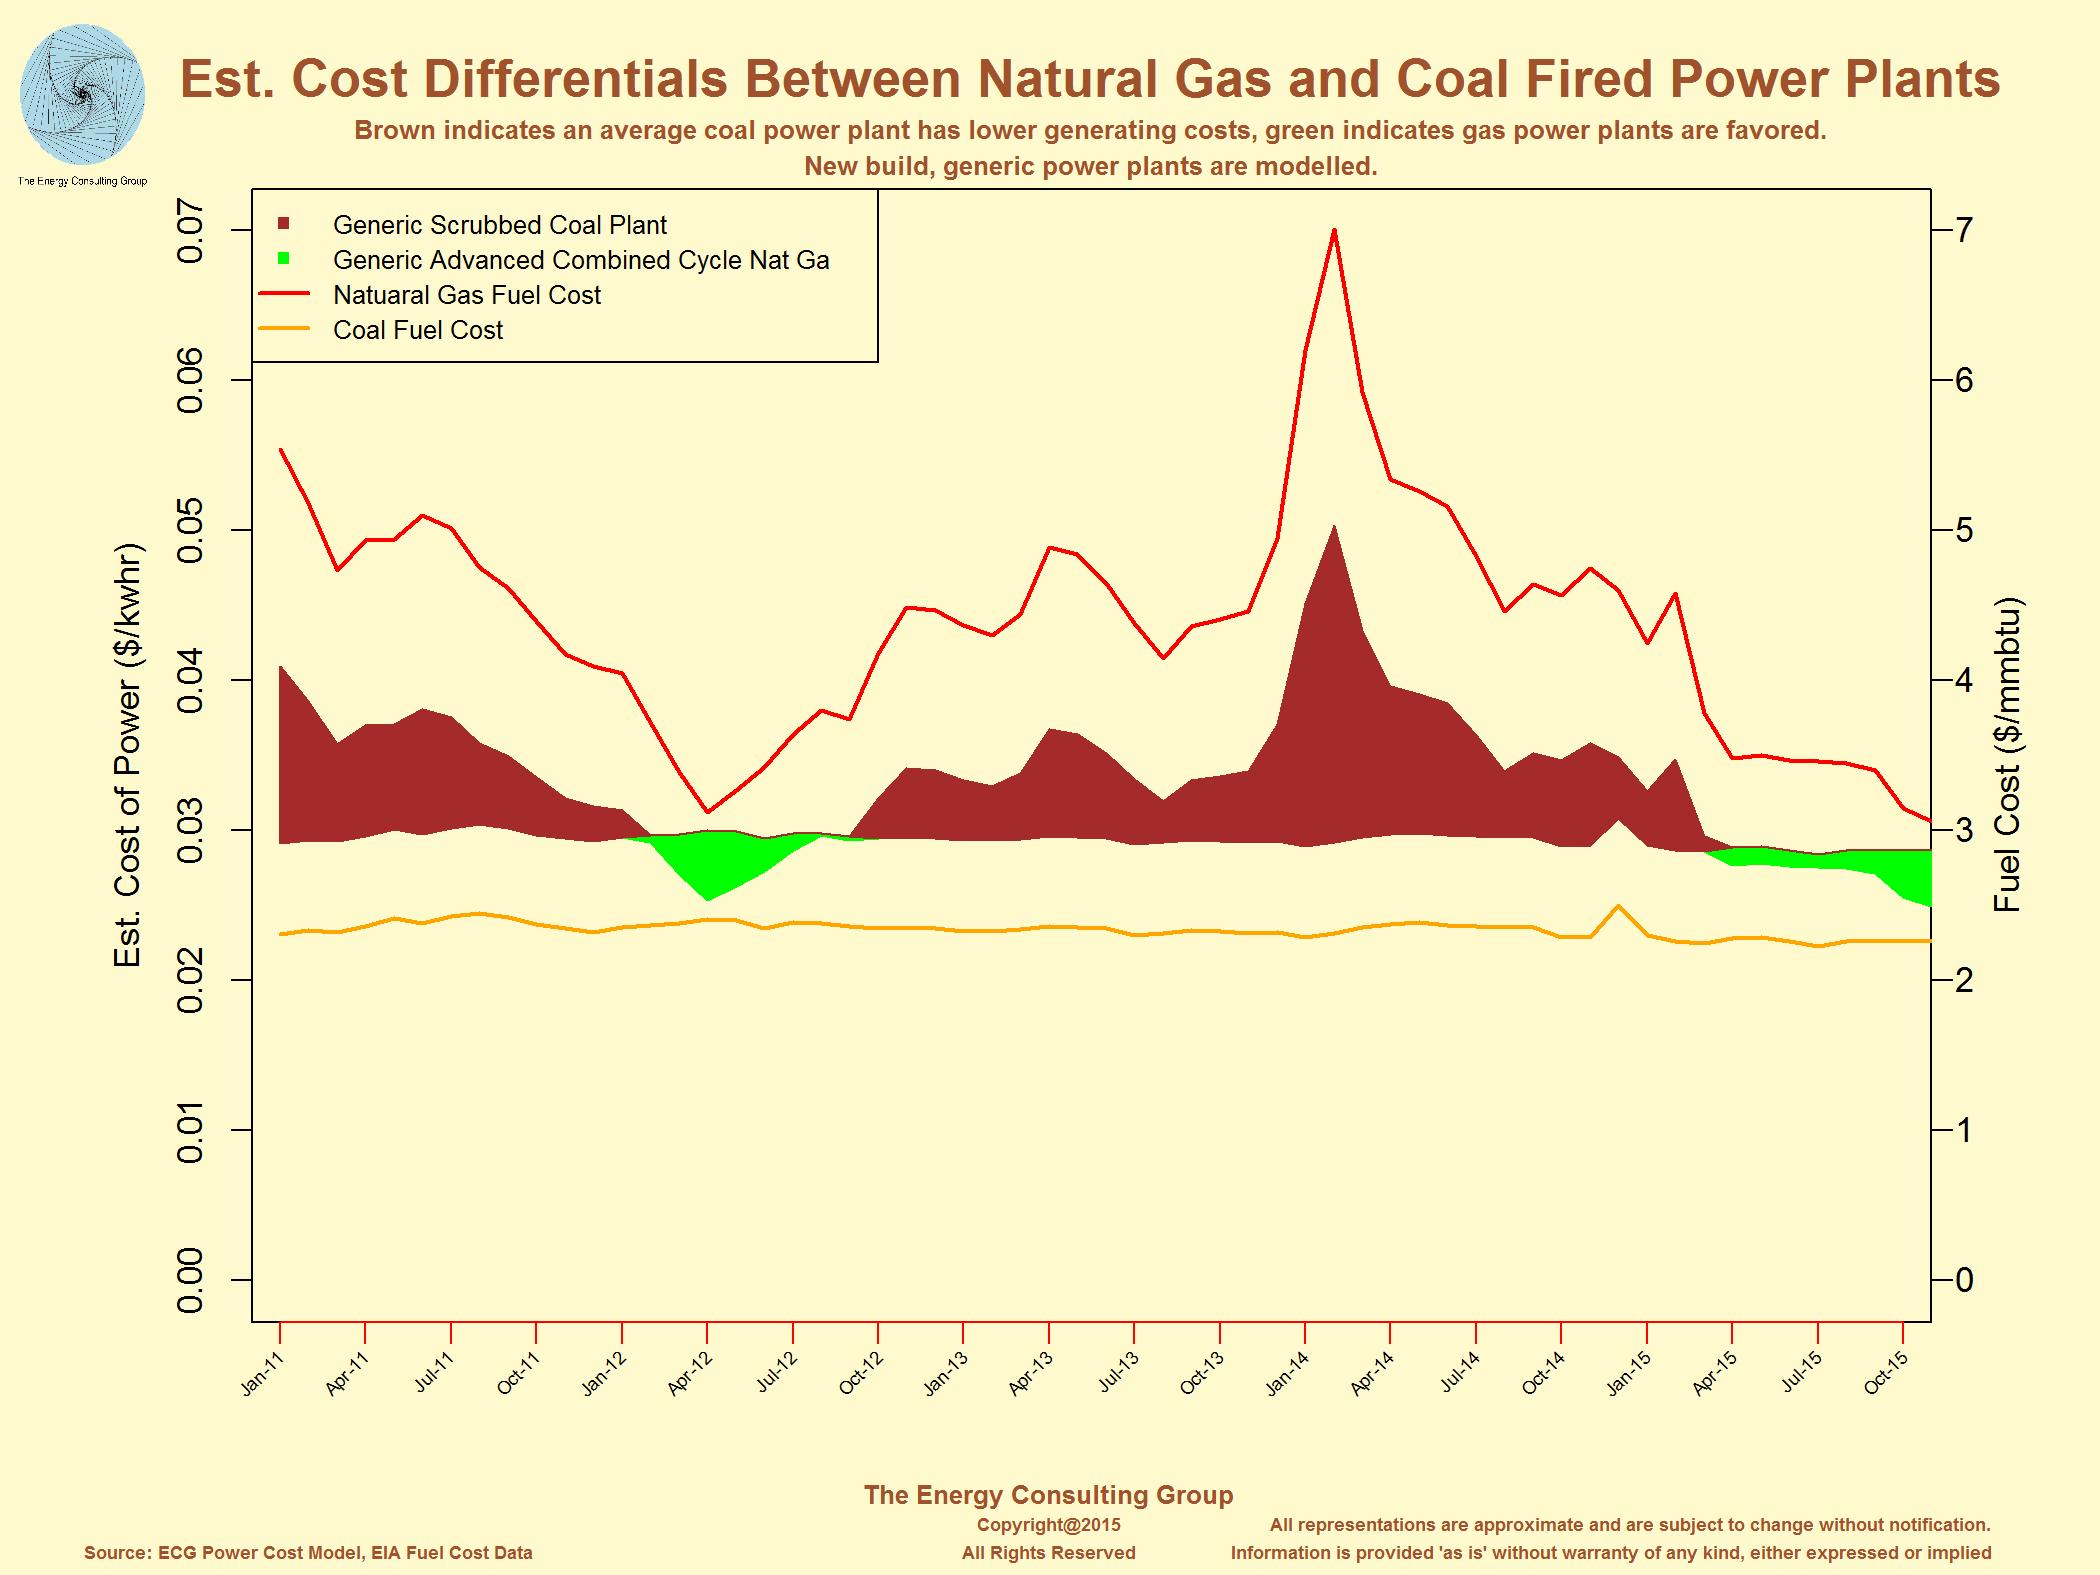 USA Power Generation Summary